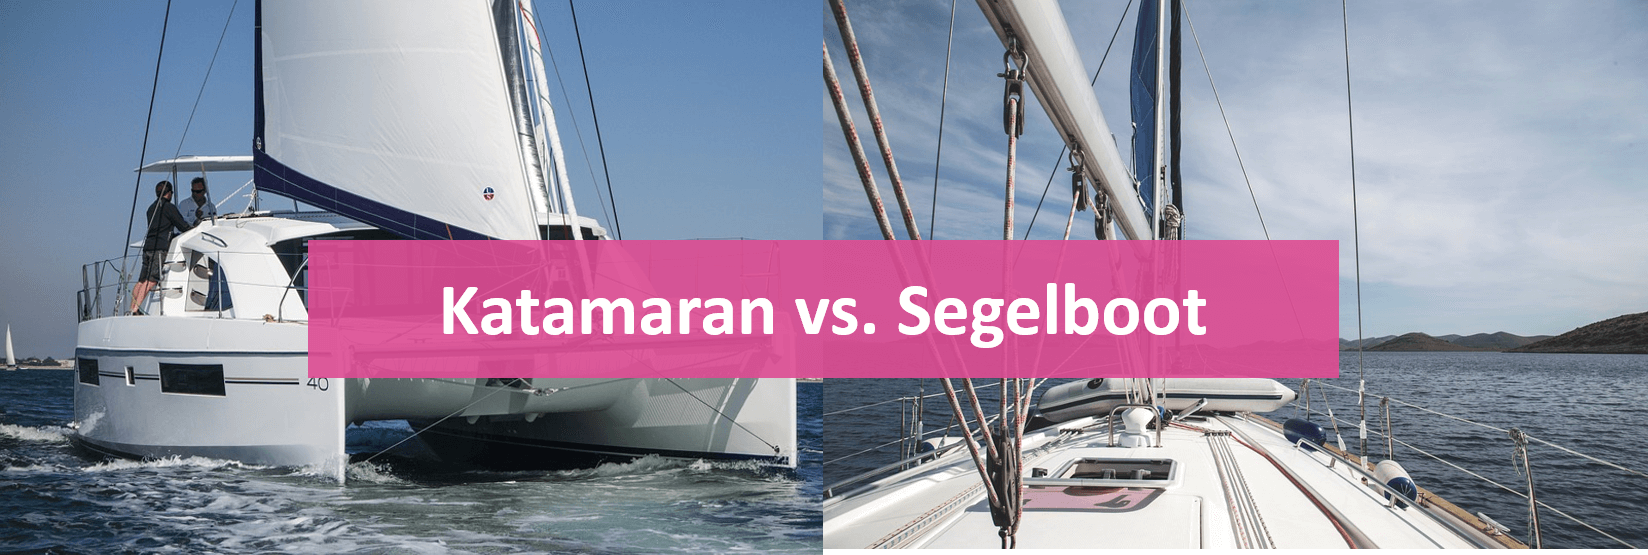 Yacht chartern Katamaran versus Segelboot